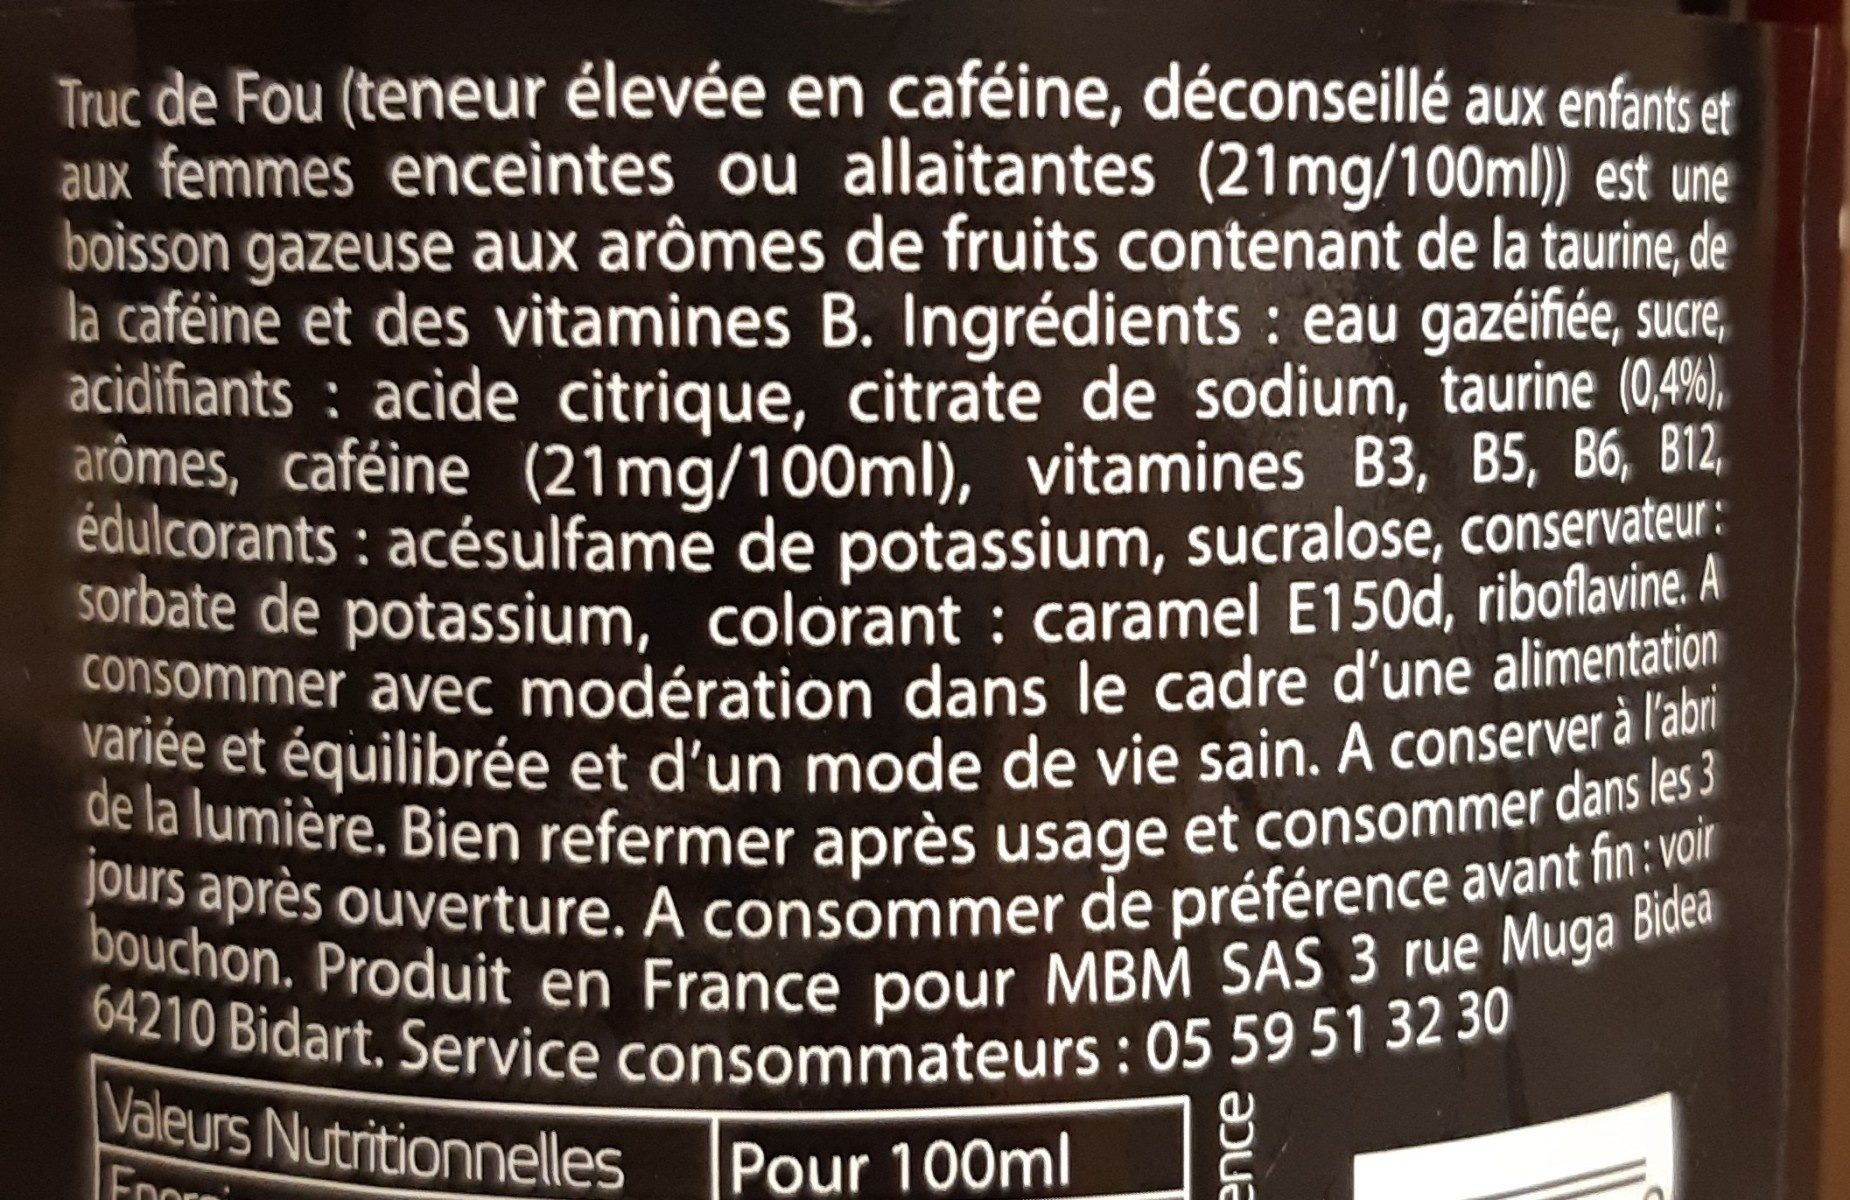 Truc de fou - Ingrediënten - fr